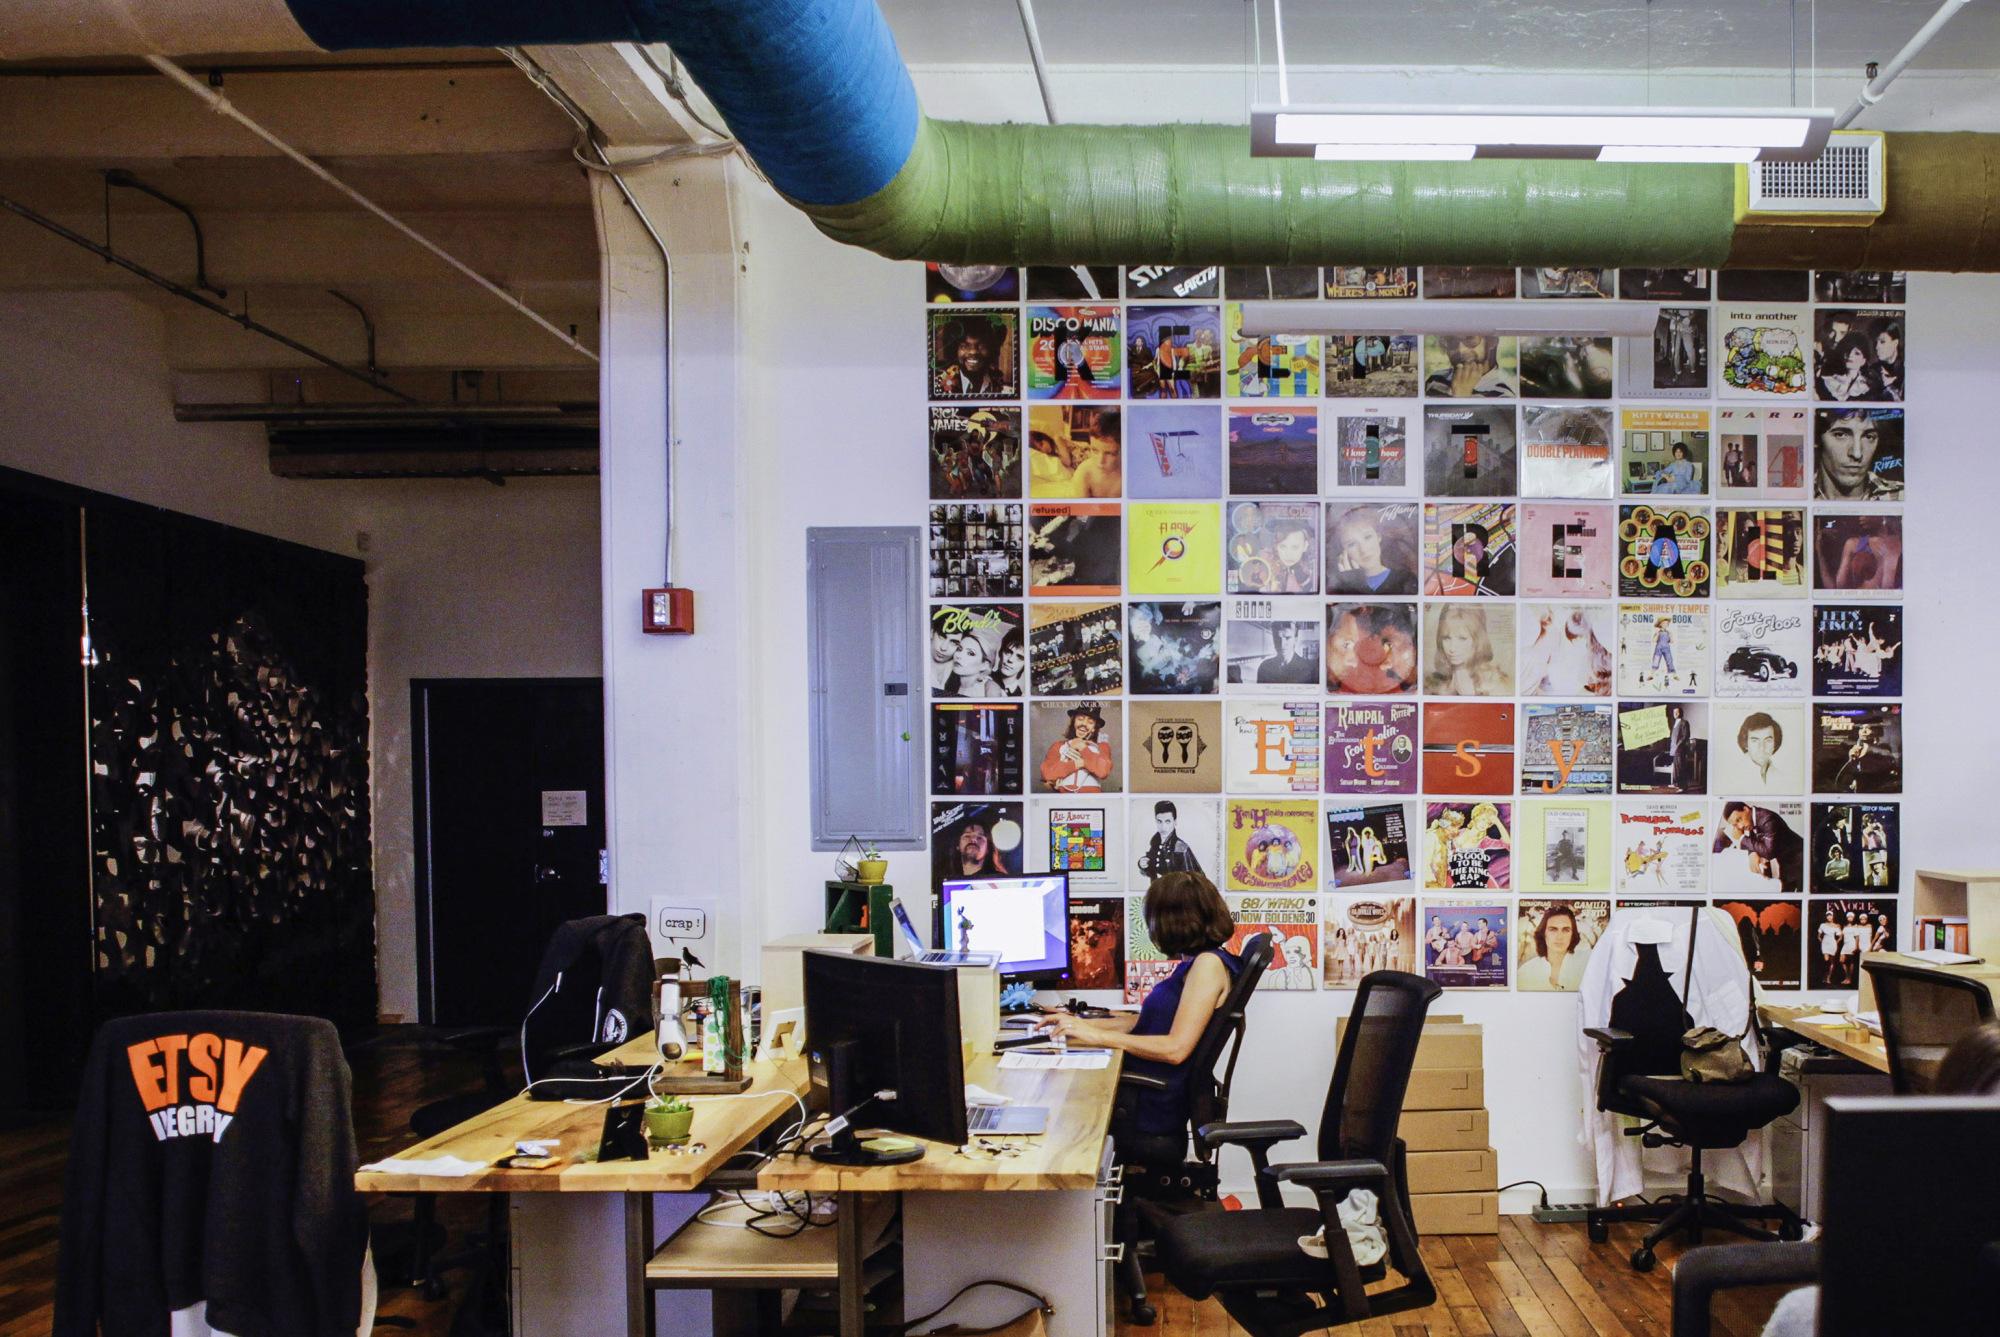 83 interior design internships nyc summer 2015 find for Interior design fees nyc